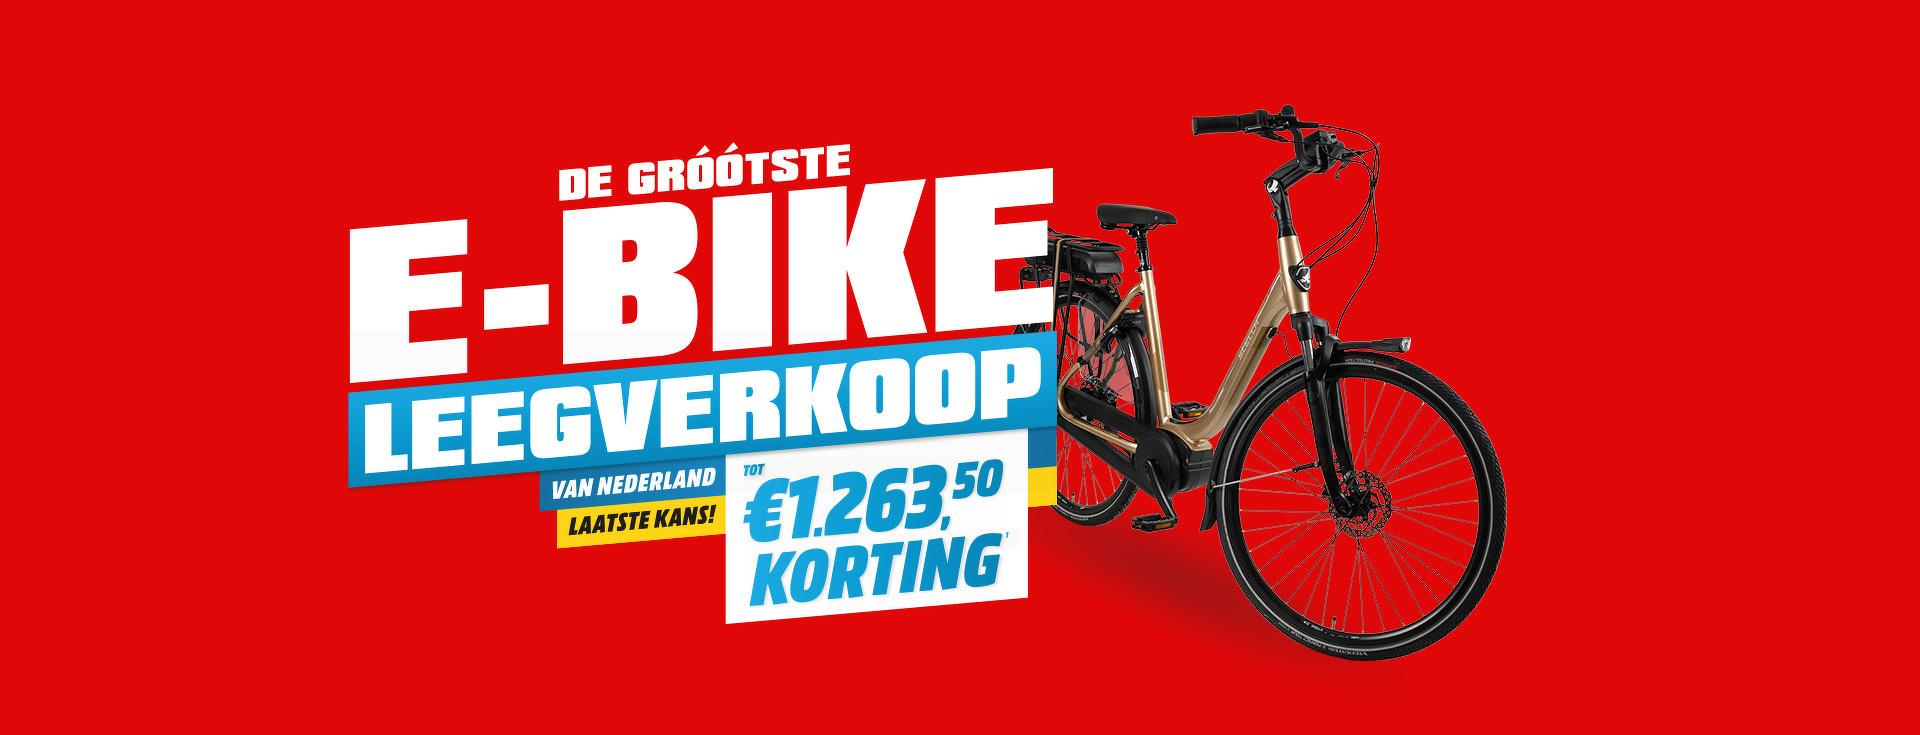 E-bike Leegverkoop